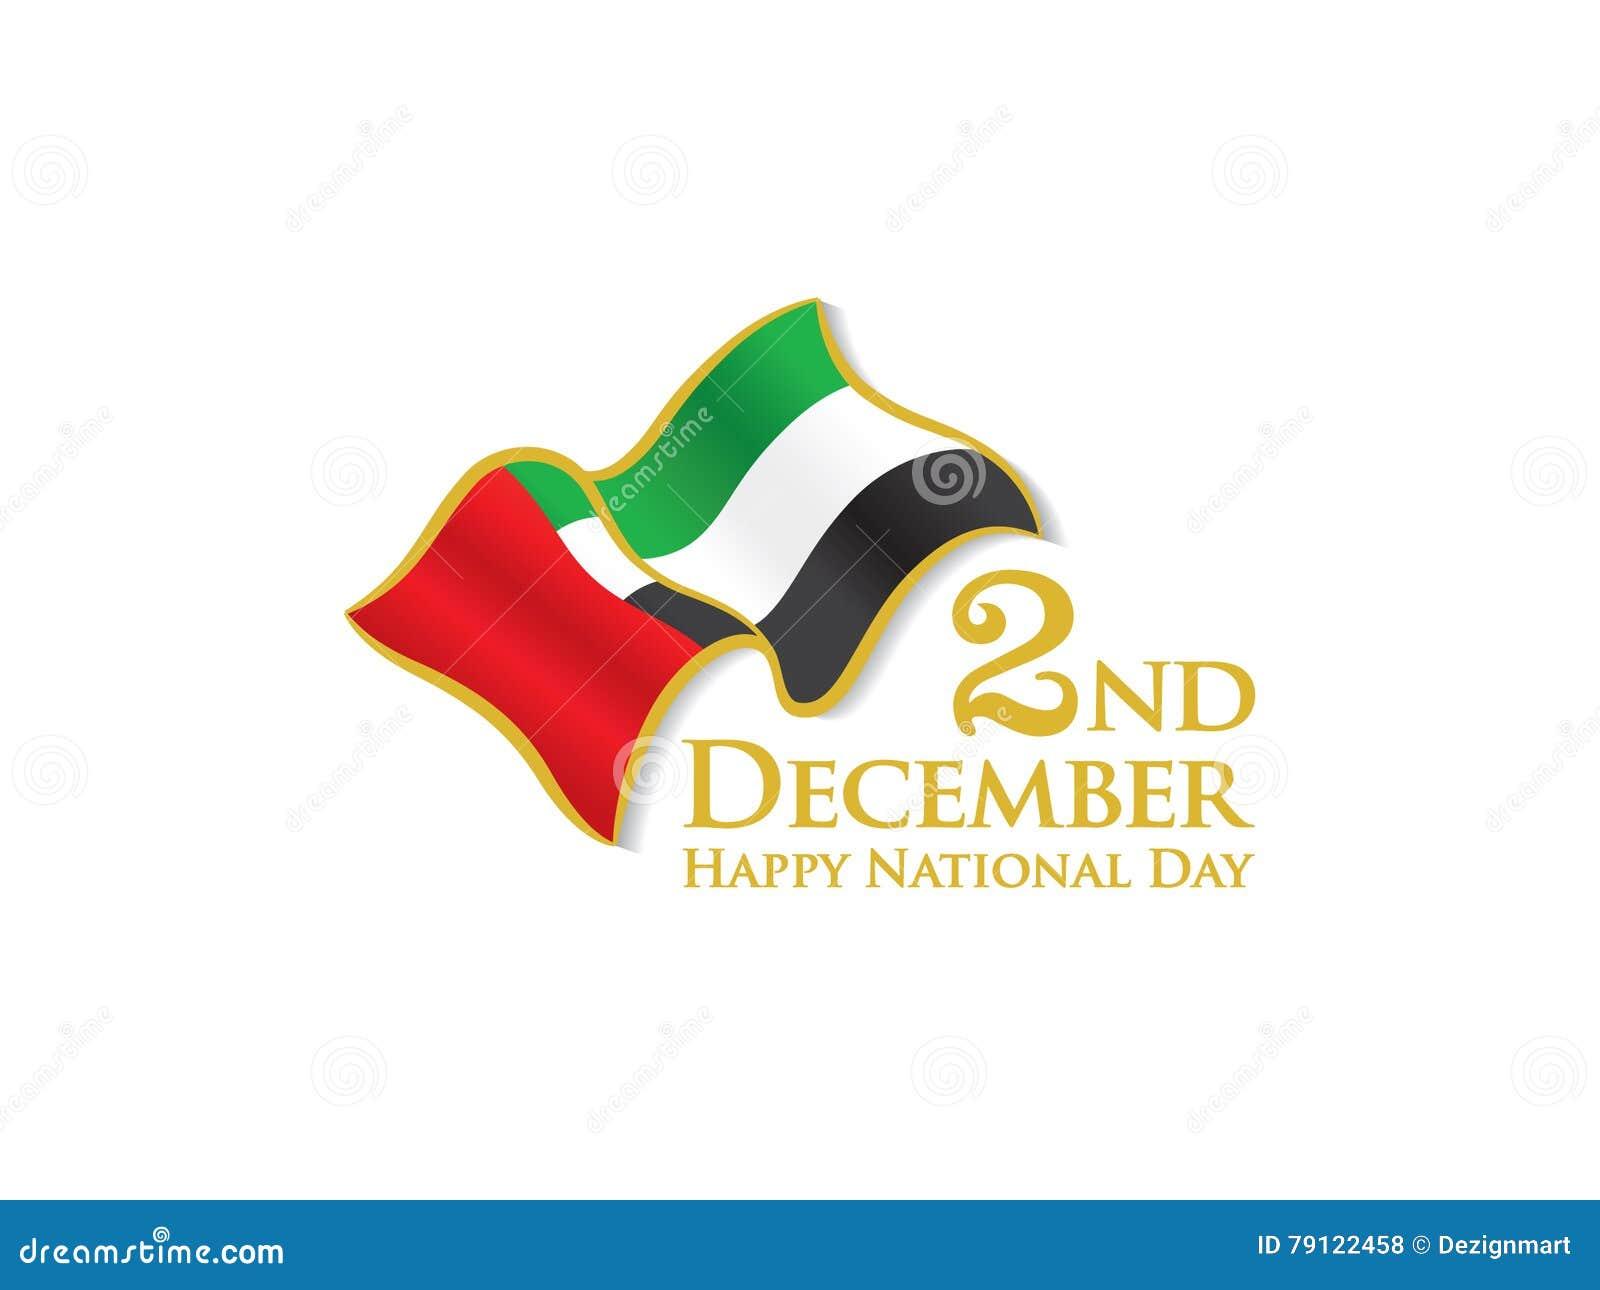 UAE 2nd December logo with waving Flag